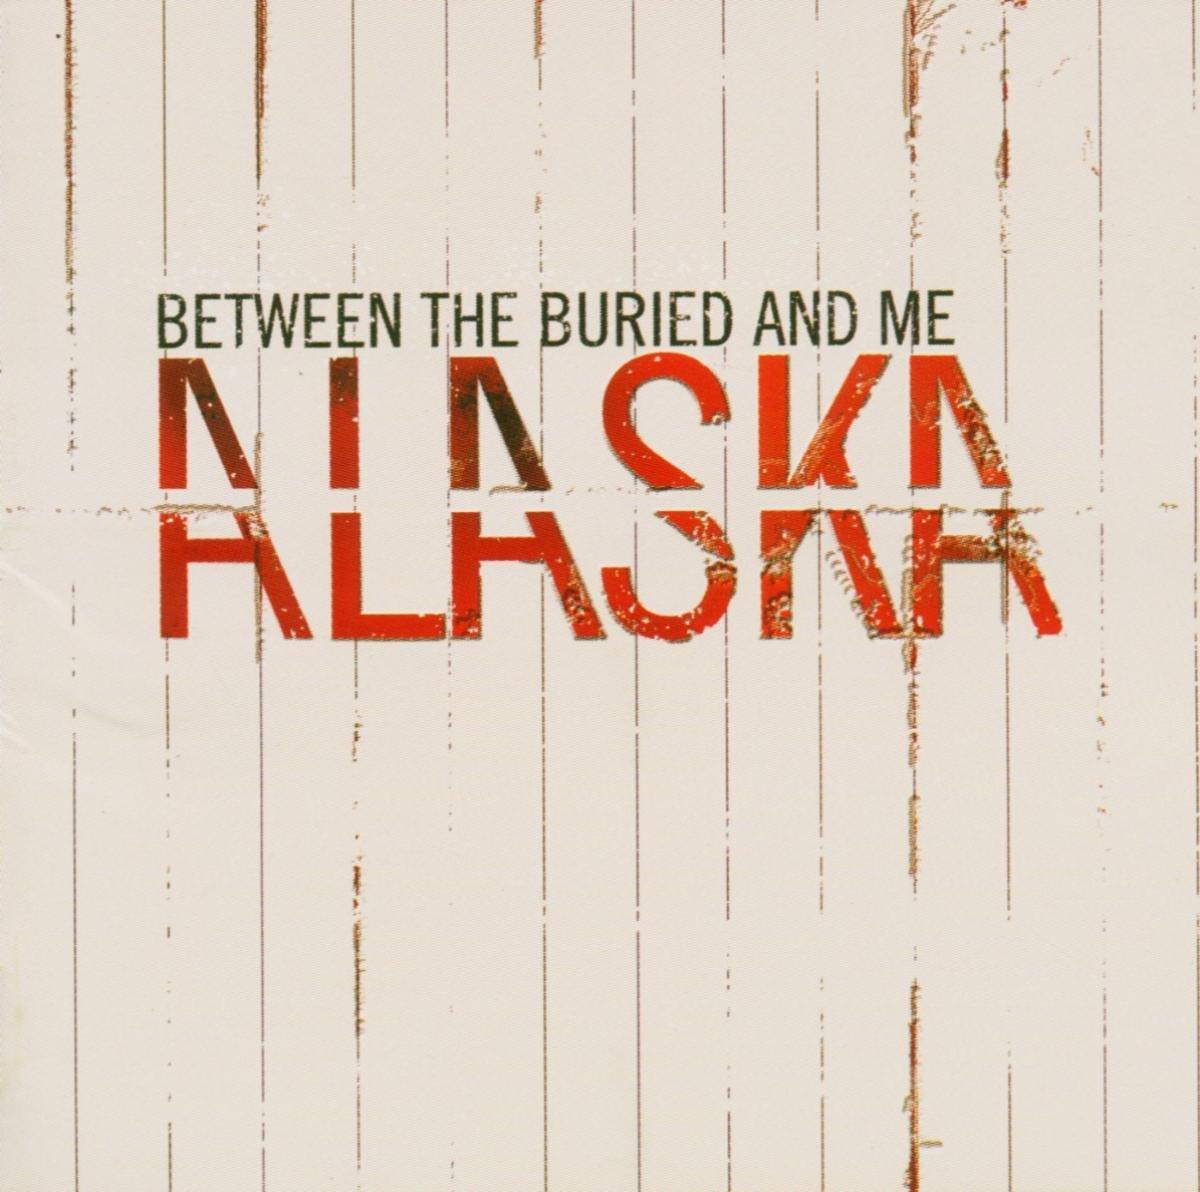 Between The Buried And Me - Alaska - Amazon.com Music